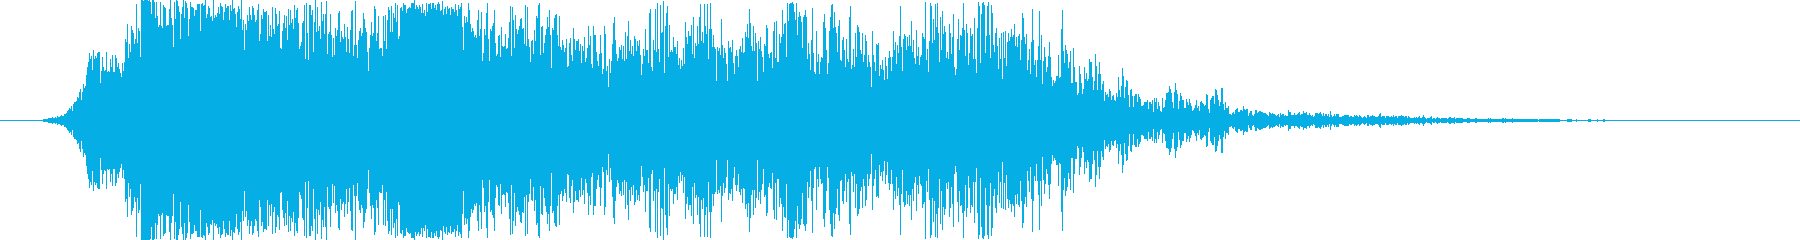 SCI FI メニュー閉じるヘビー02の再生済みの波形